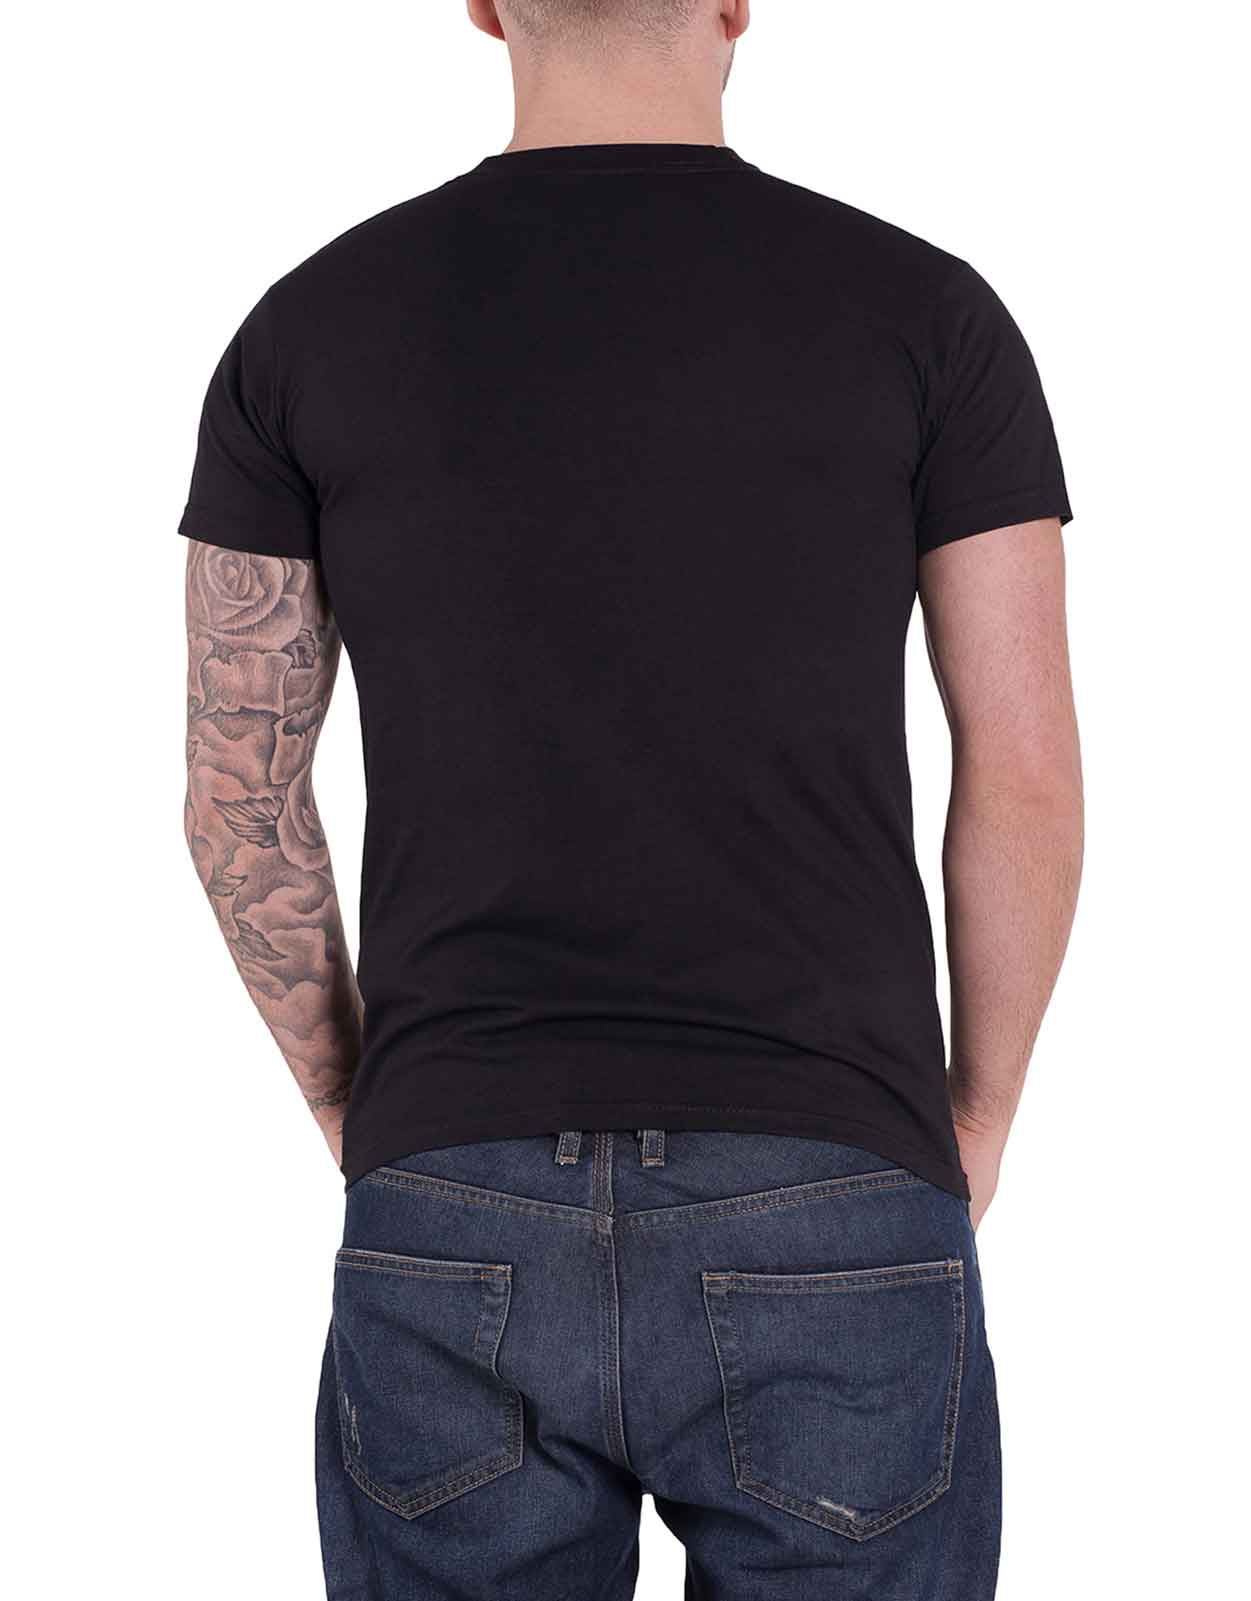 Official-Motley-Crue-T-Shirt-Shout-at-the-Devil-The-Dirt-Tour-Band-Logo-Mens thumbnail 29